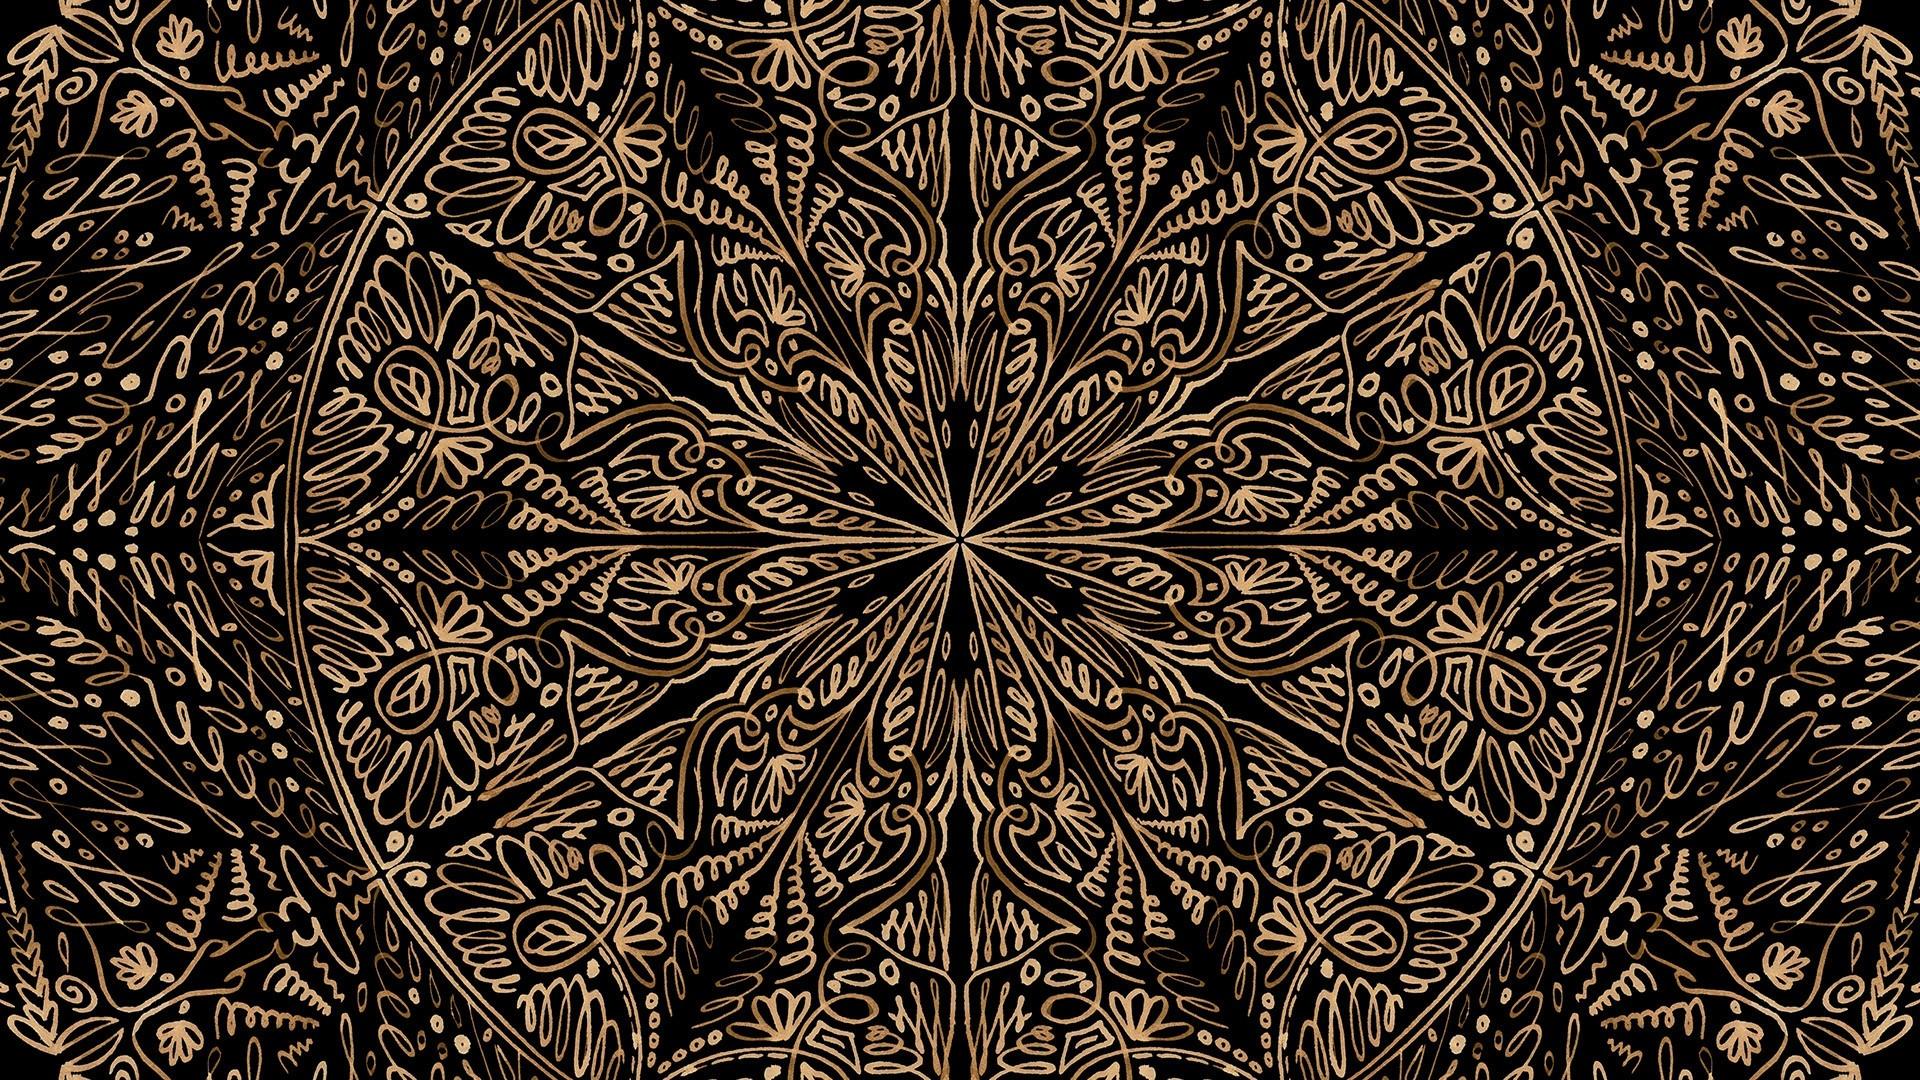 Mandala Wallpaper Picture hd